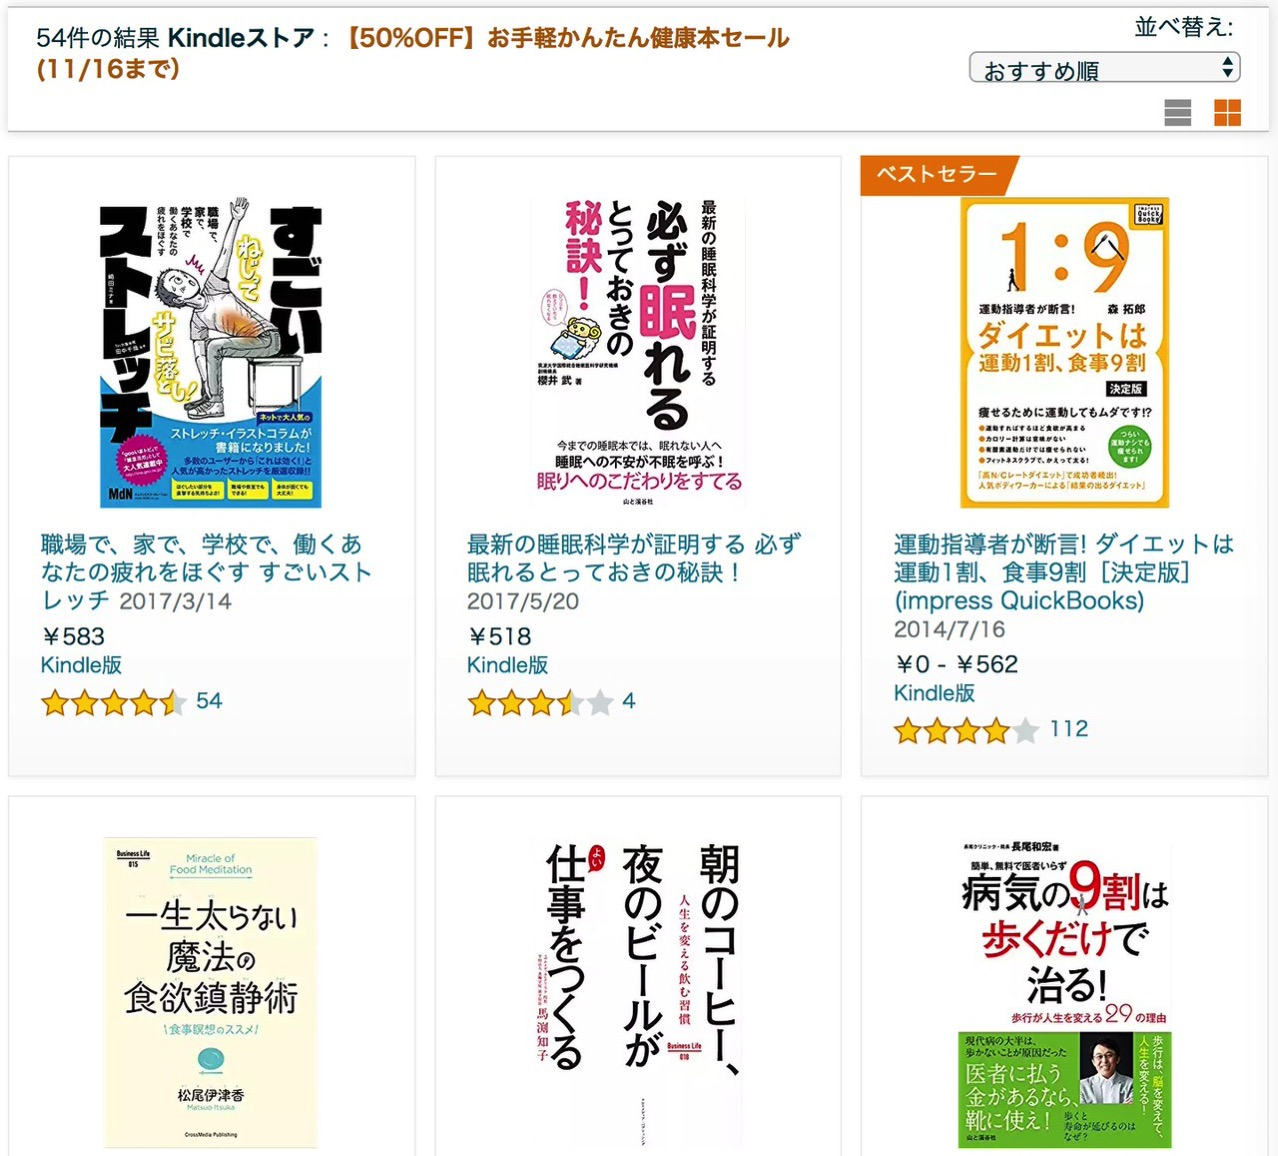 【Kindleセール】50%オフ!「お手軽かんたん健康本セール」実施中(11/16まで)